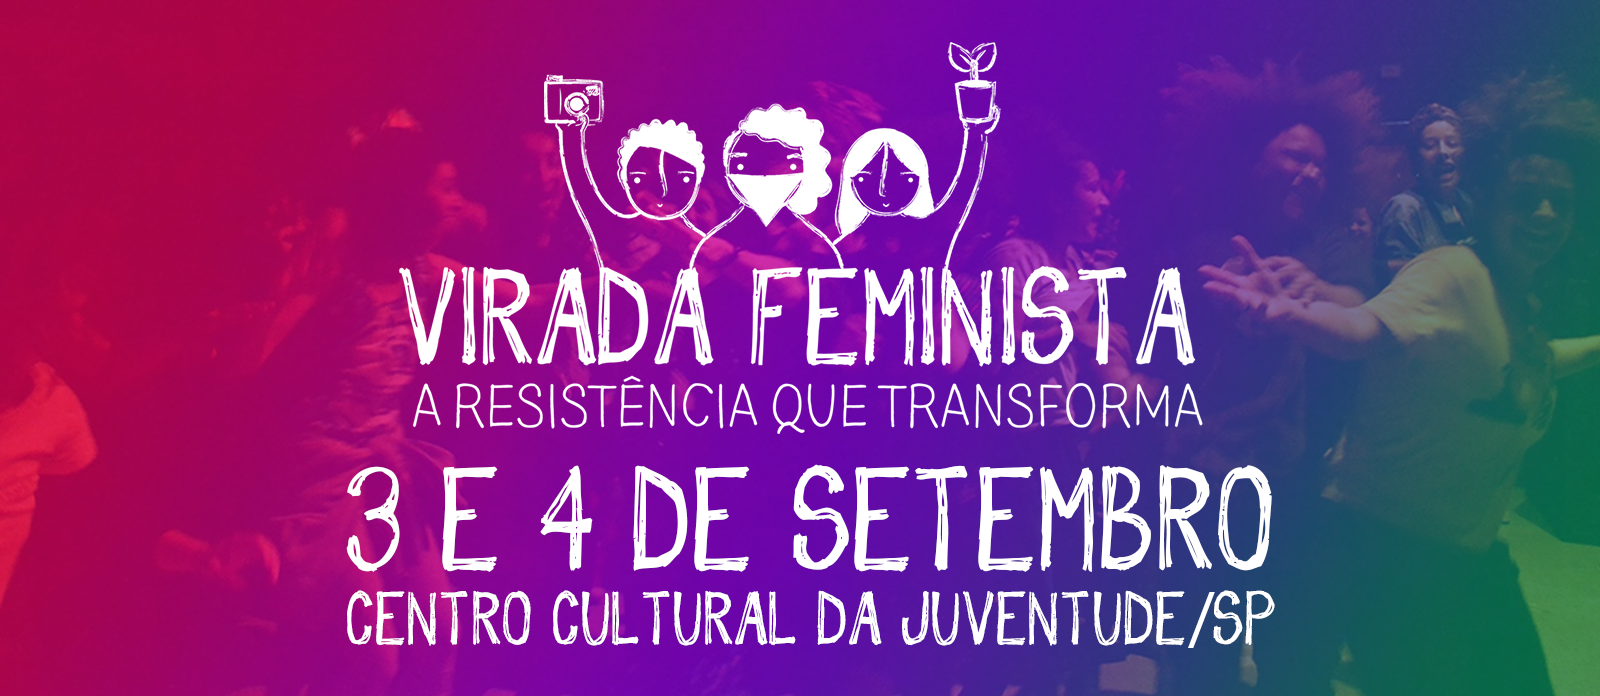 virada feminista